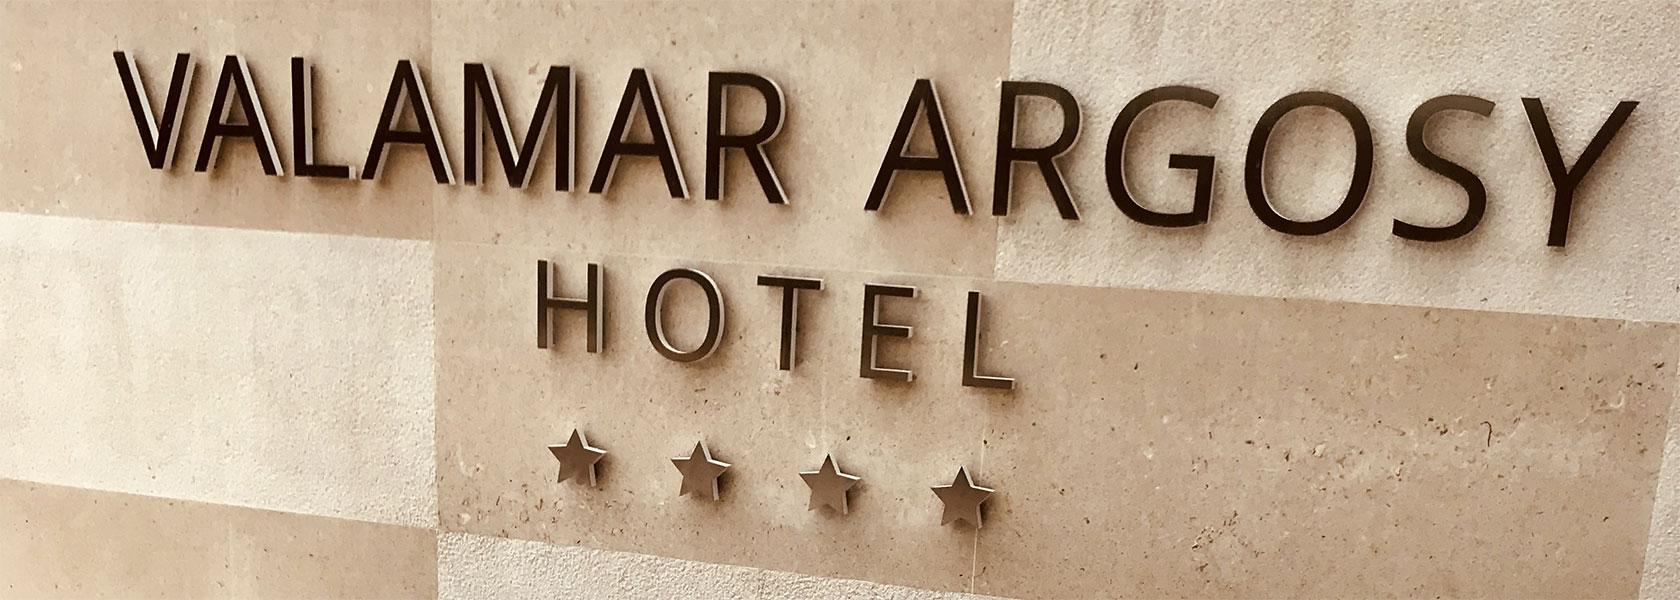 Valamar-Argosy-Hotel-2018-00